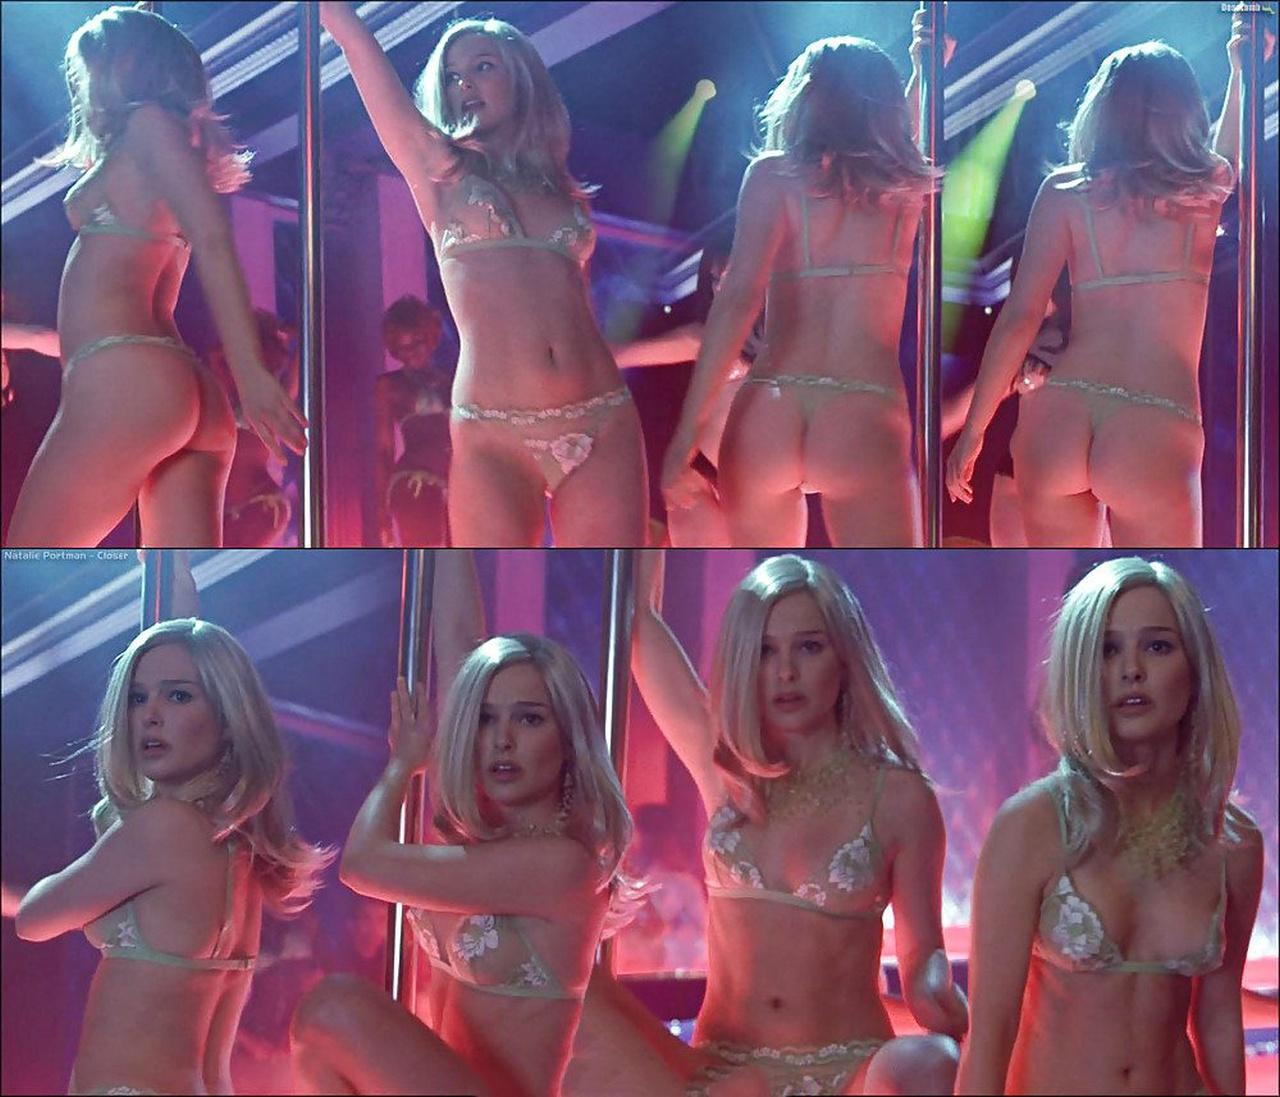 Natalie portman strip tease